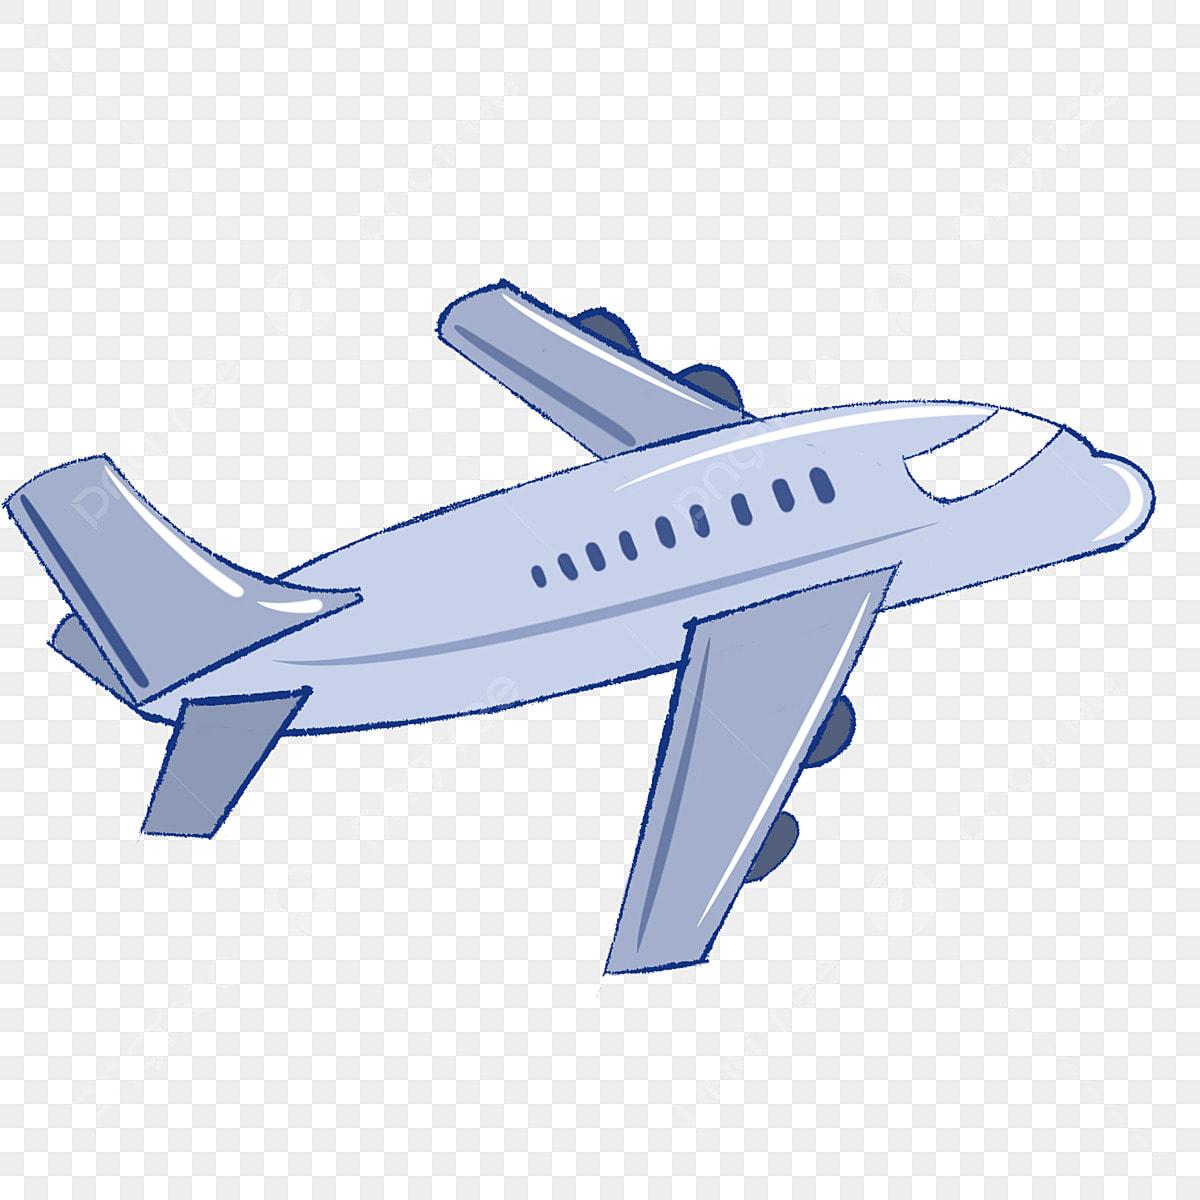 Cartoon Yellow Airplane Illustration Flying Airplane Cartoon